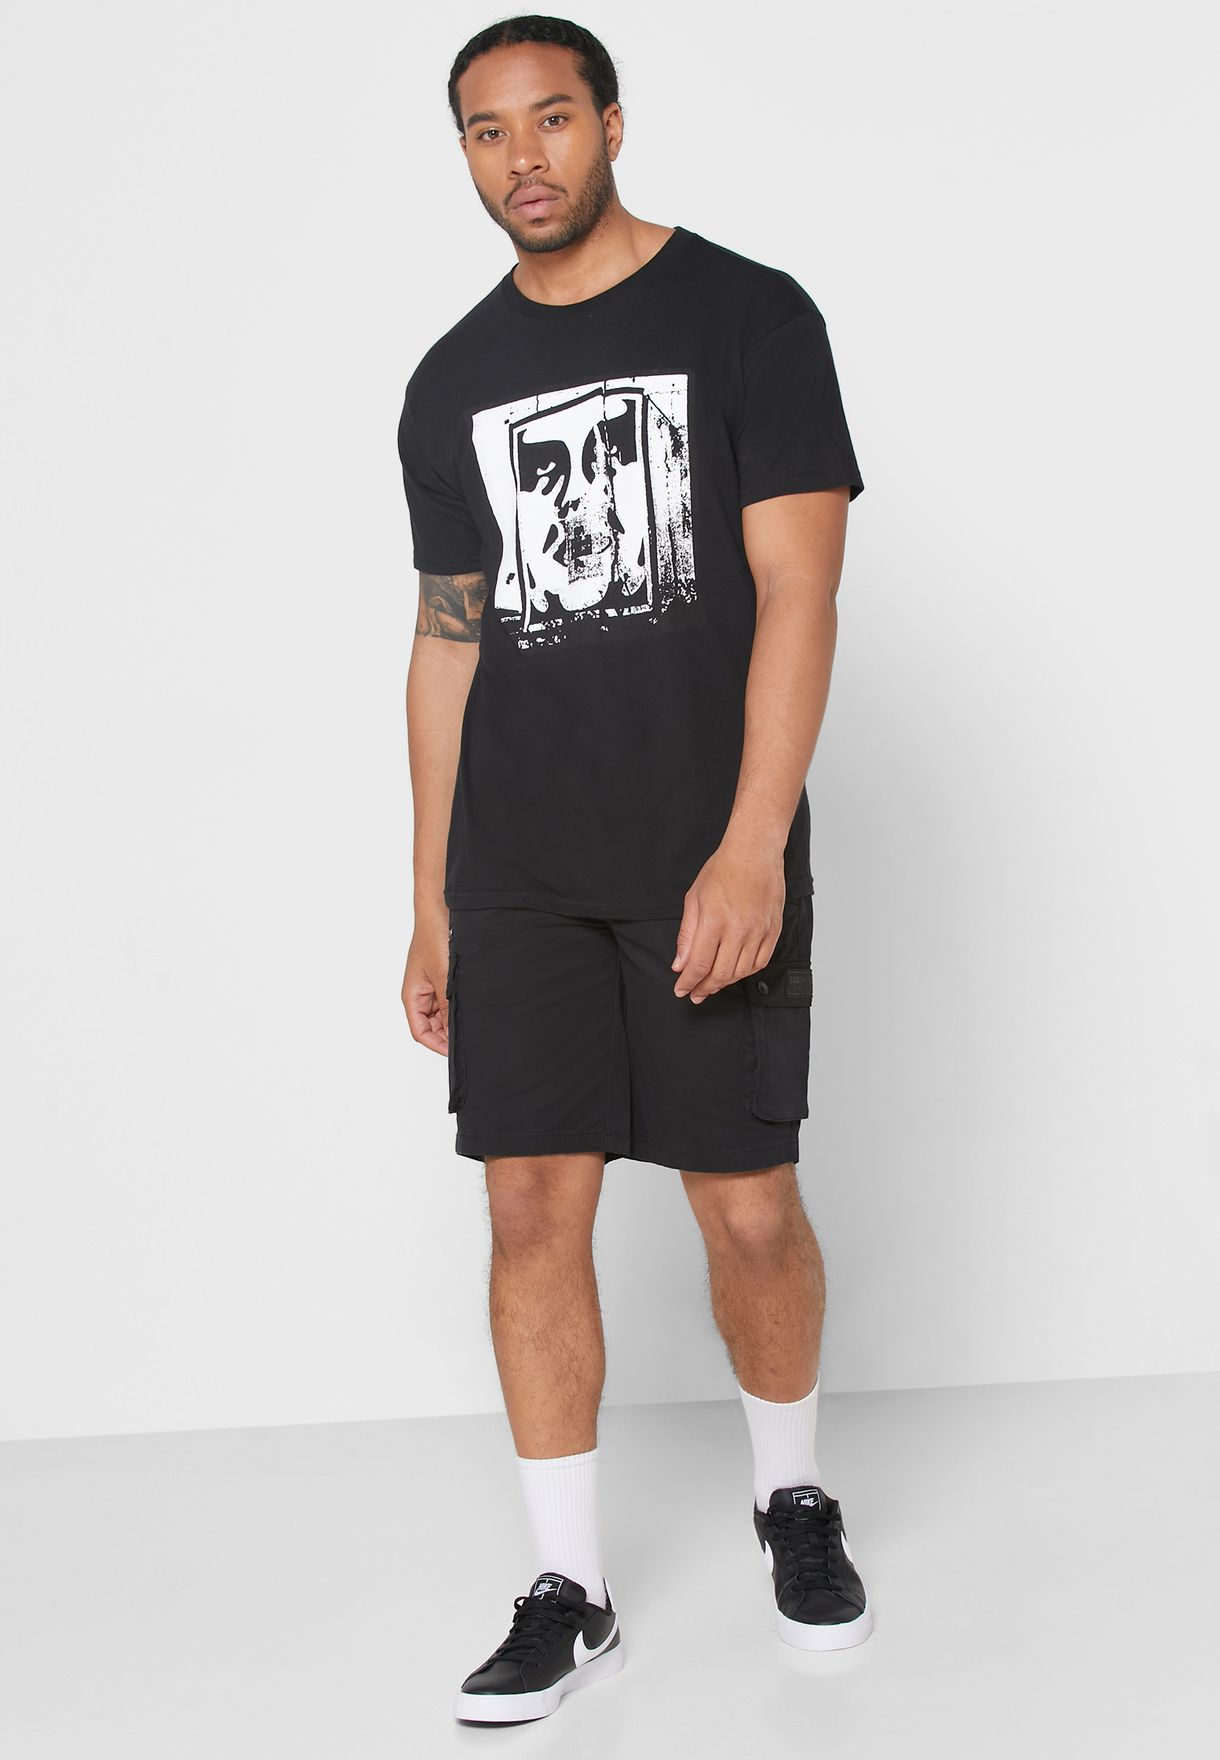 Obey Bomb The Planet T-shirt - Fashion